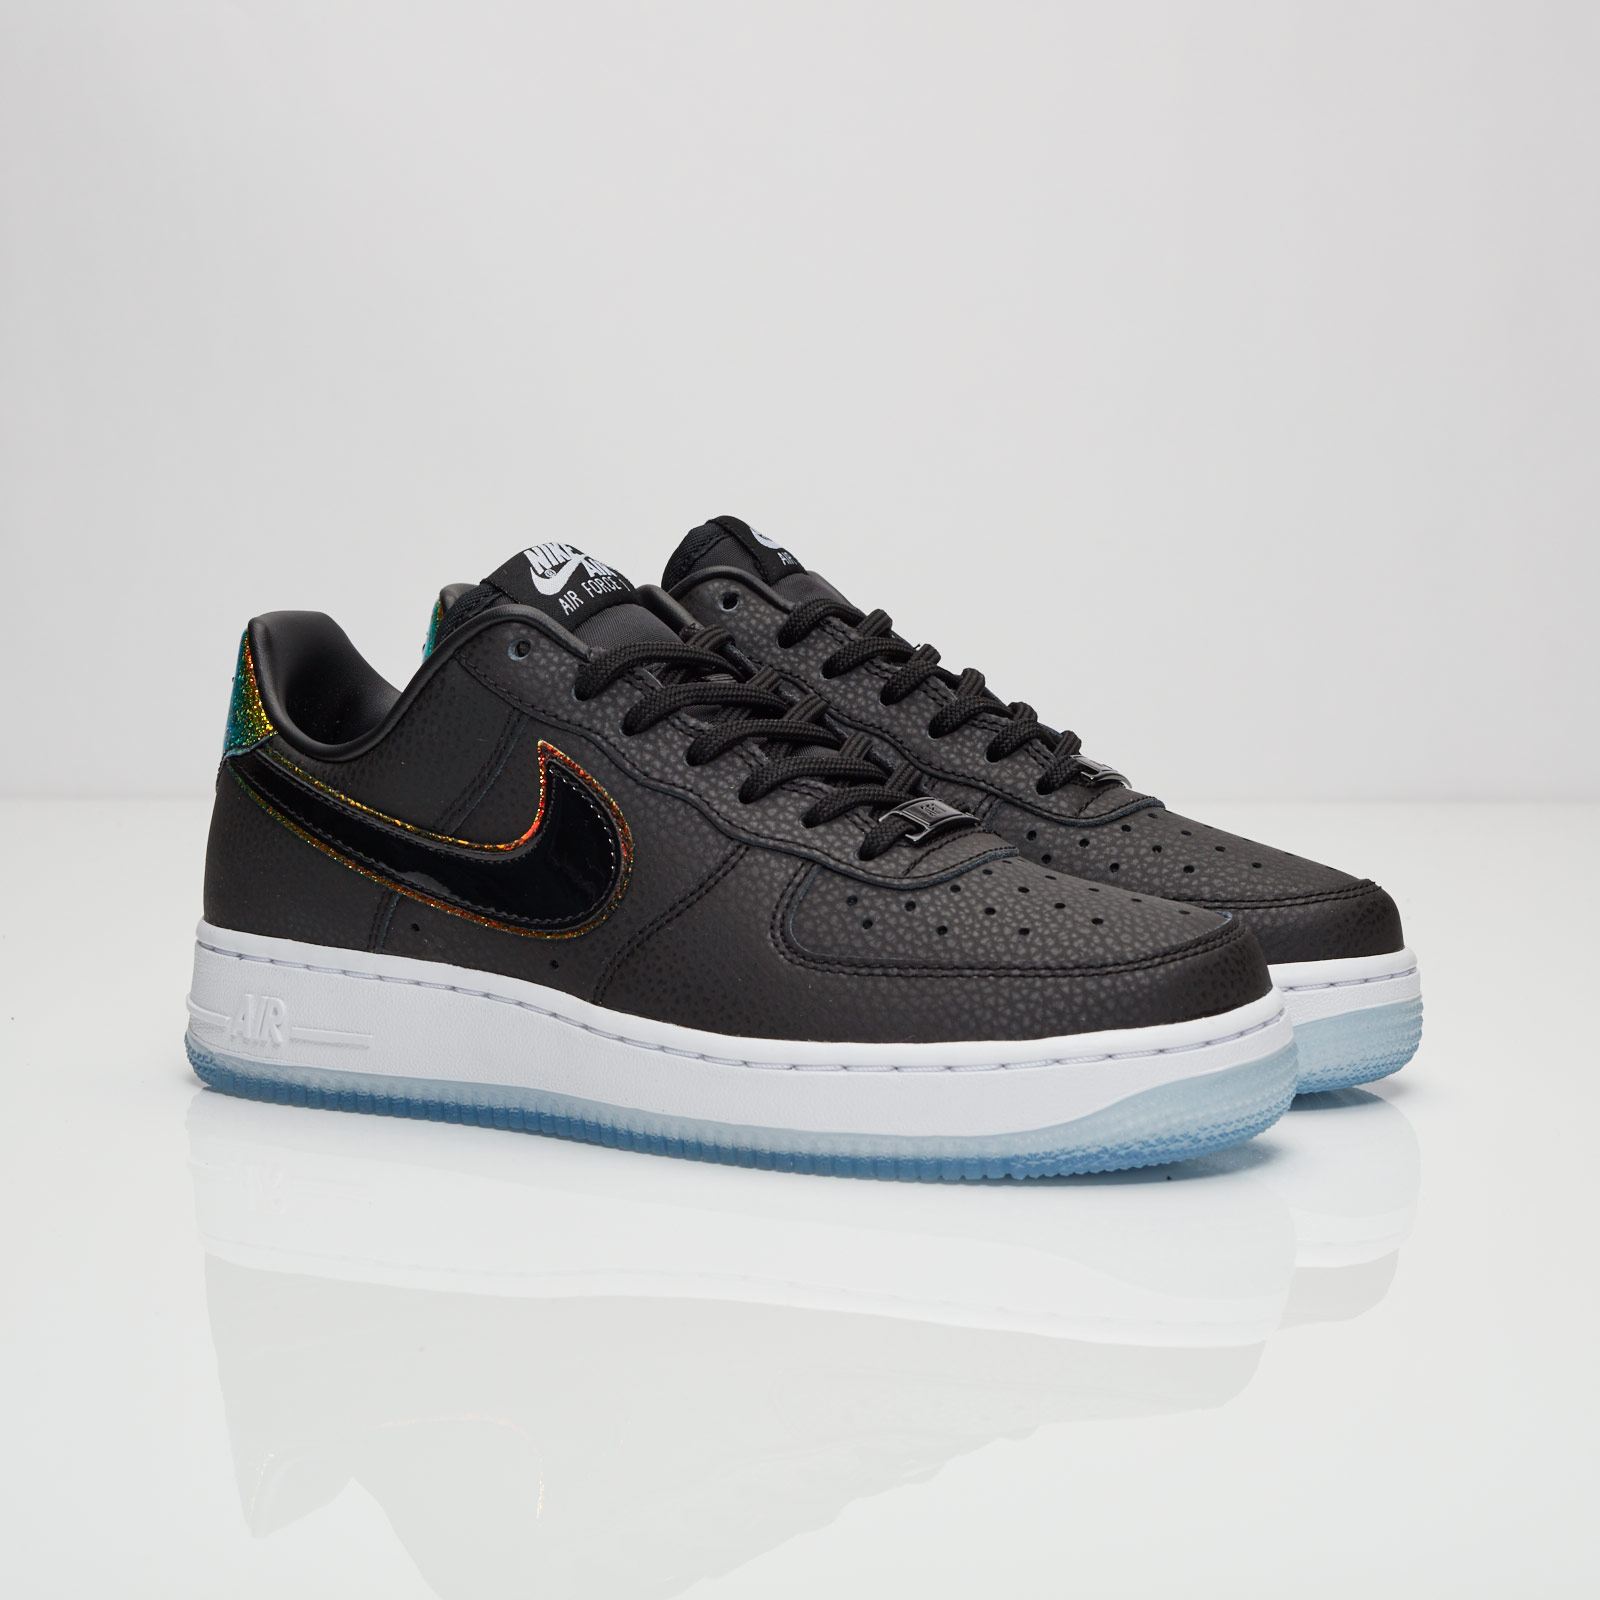 online store d133b 14b93 Nike Wmns Air Force 1 07 Premium